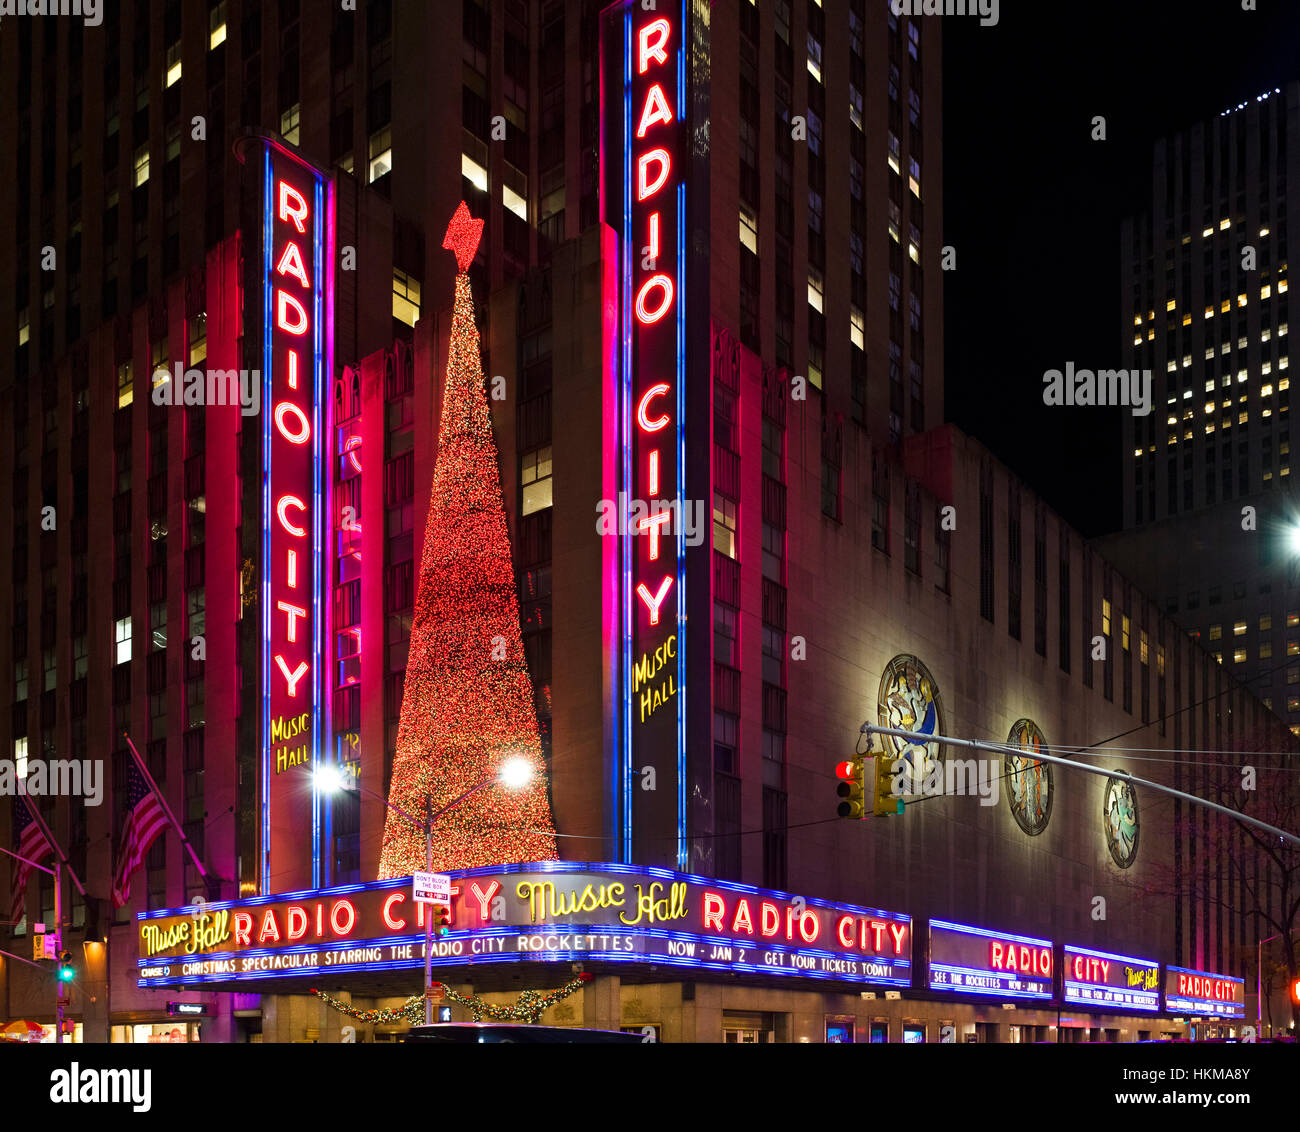 Radio City Music Hall, New York City. Radio City Music Hall, Rockefeller Center, Avenue of the Americas, Midtown - Stock Image